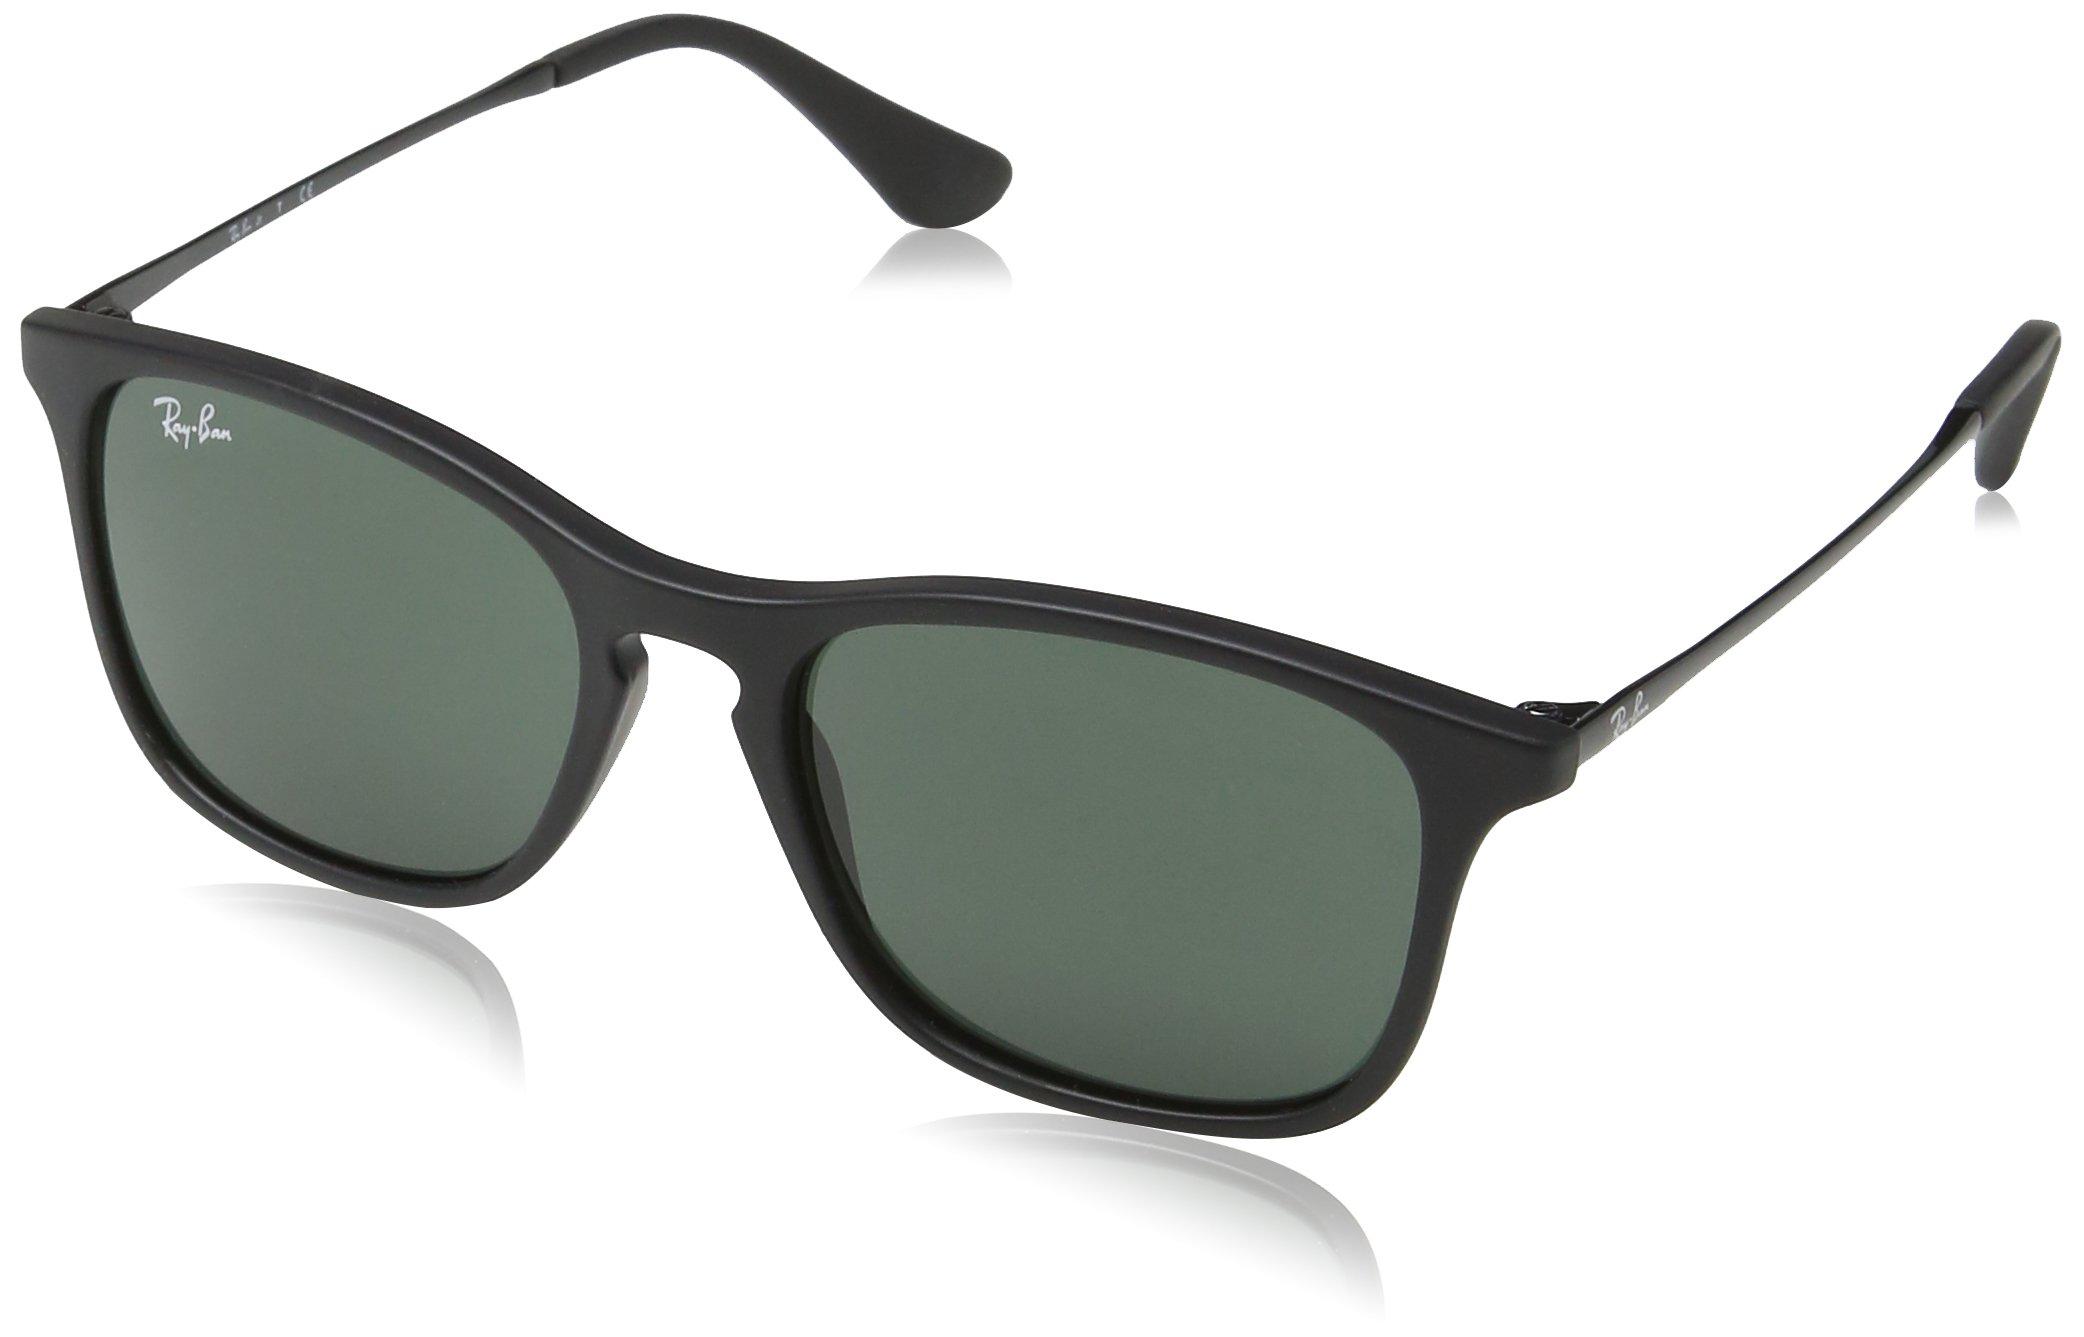 Ray-Ban Boy's Chris Junior Sunglass 0RJ9061S Rectangular Sunglasses, Rubber Black 700571, 49 mm